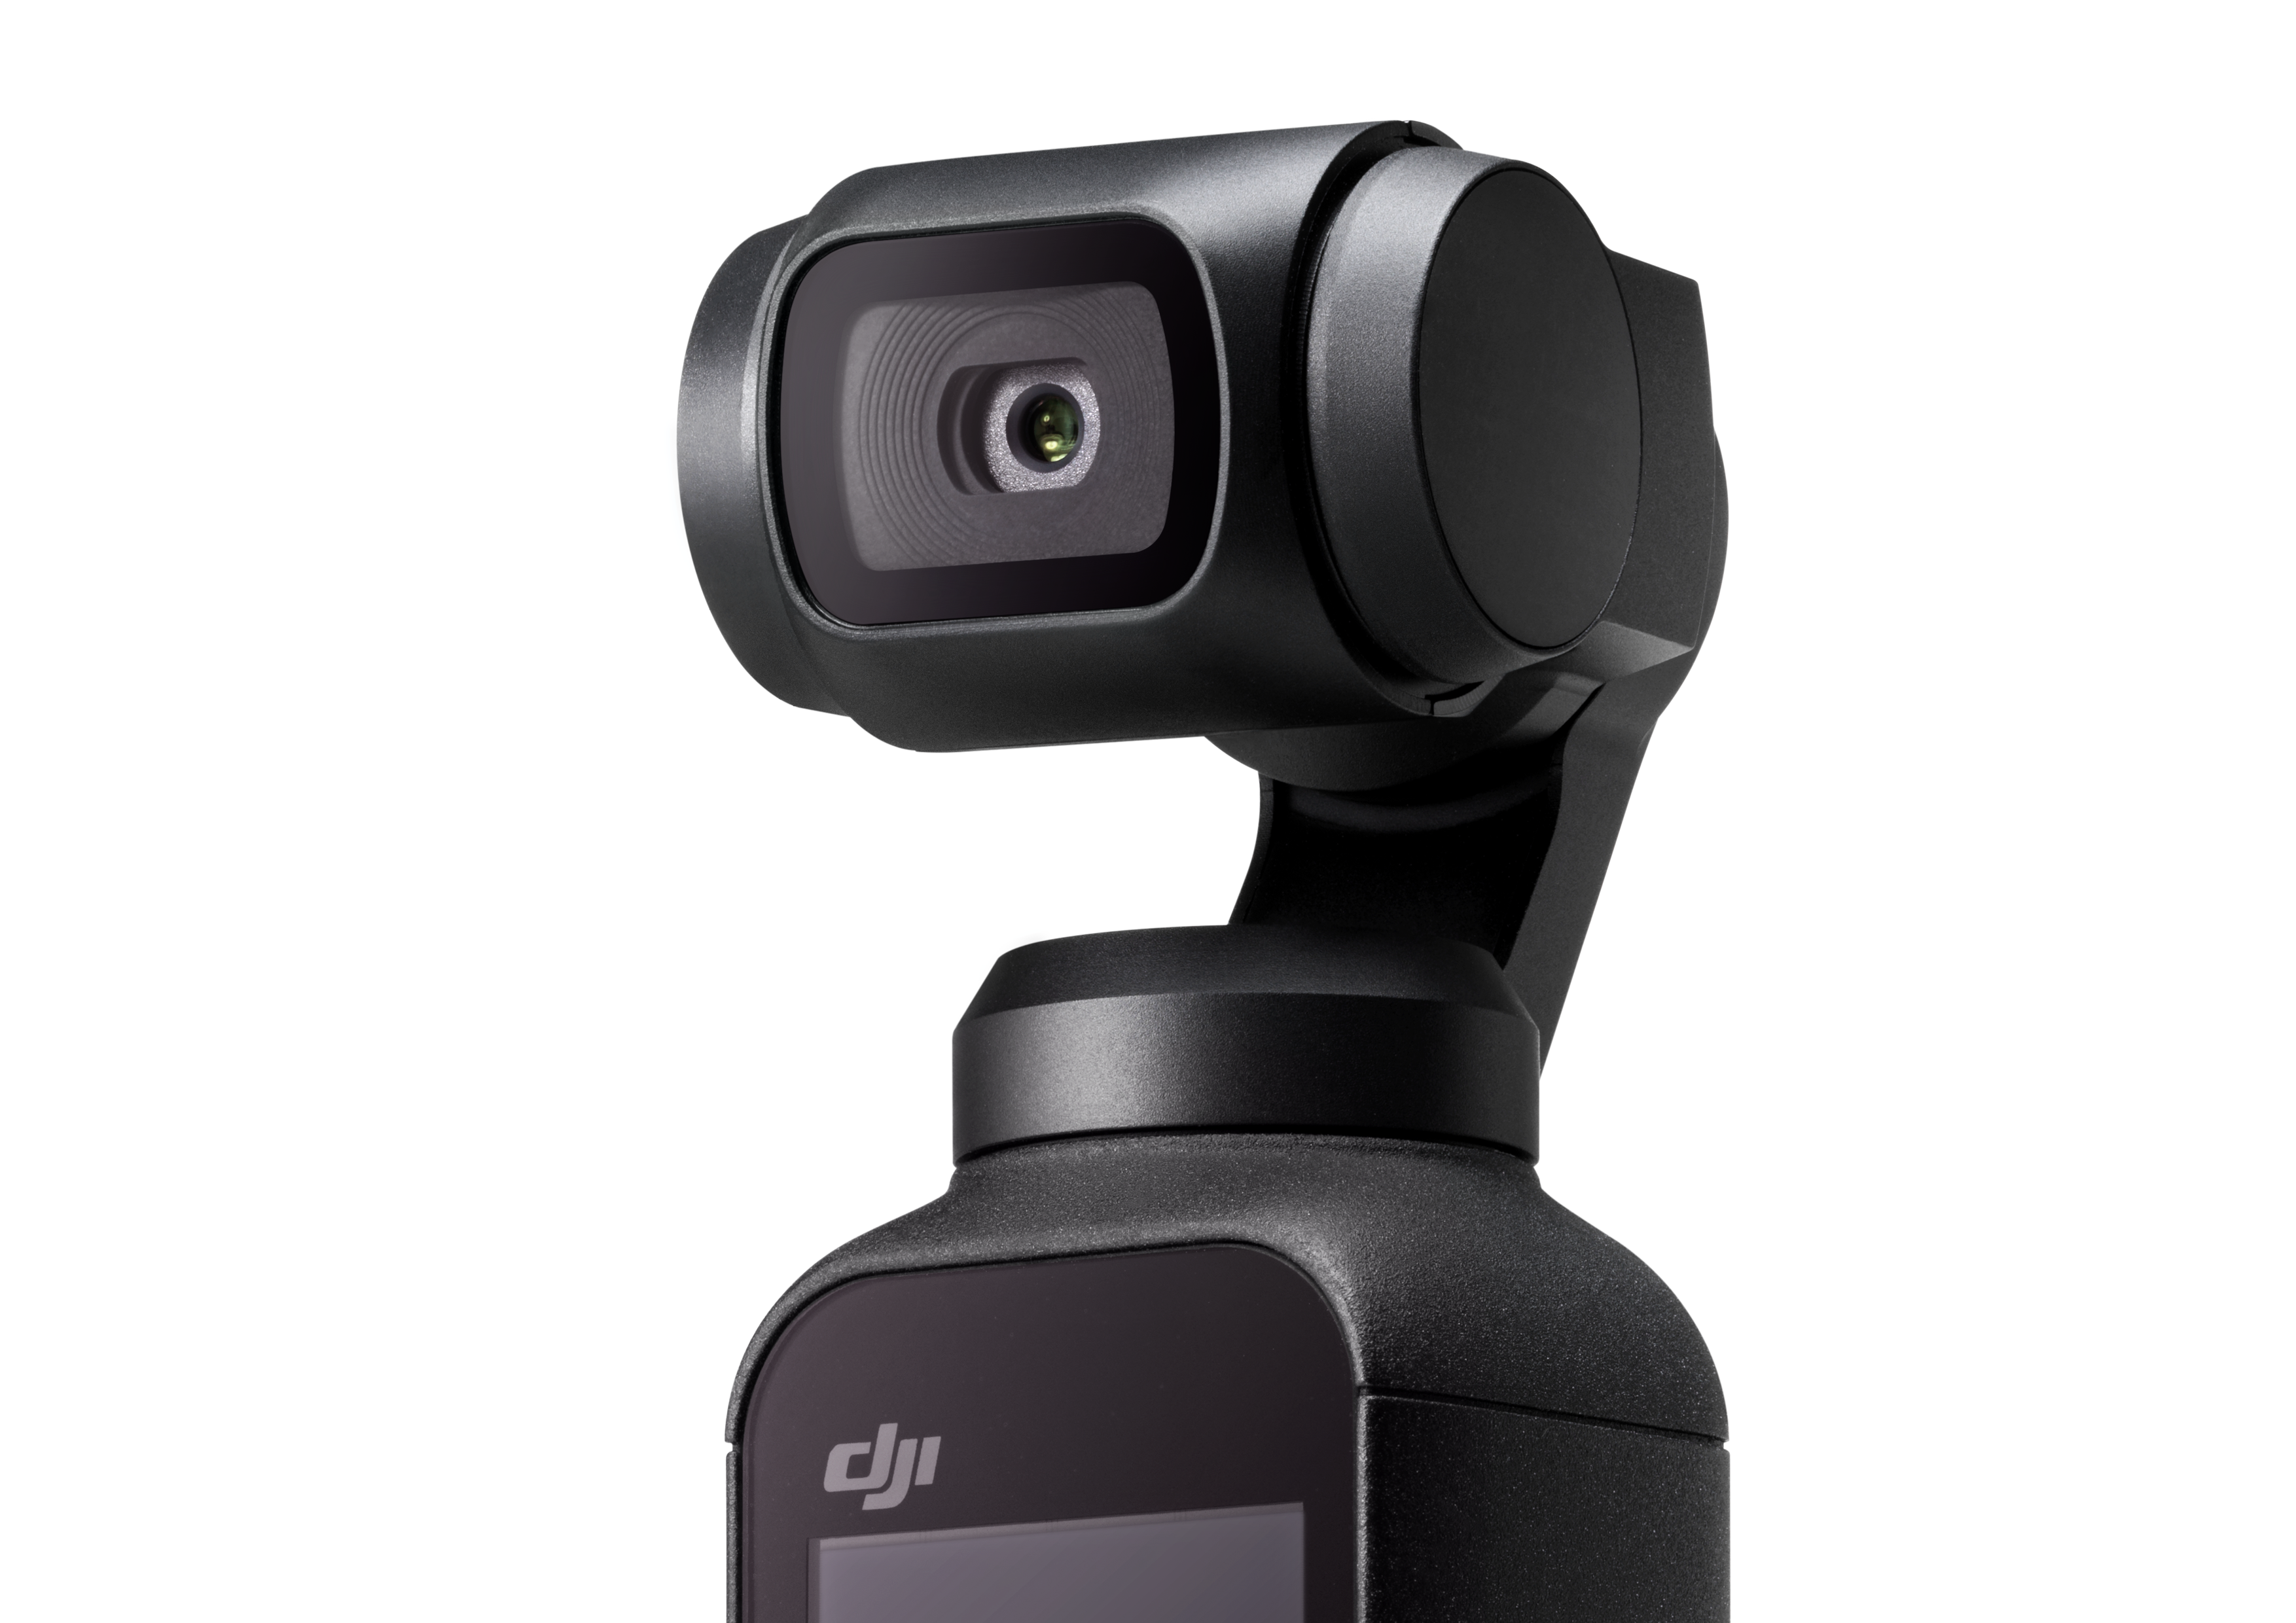 Køb DJI Osmo Pocket videokamera